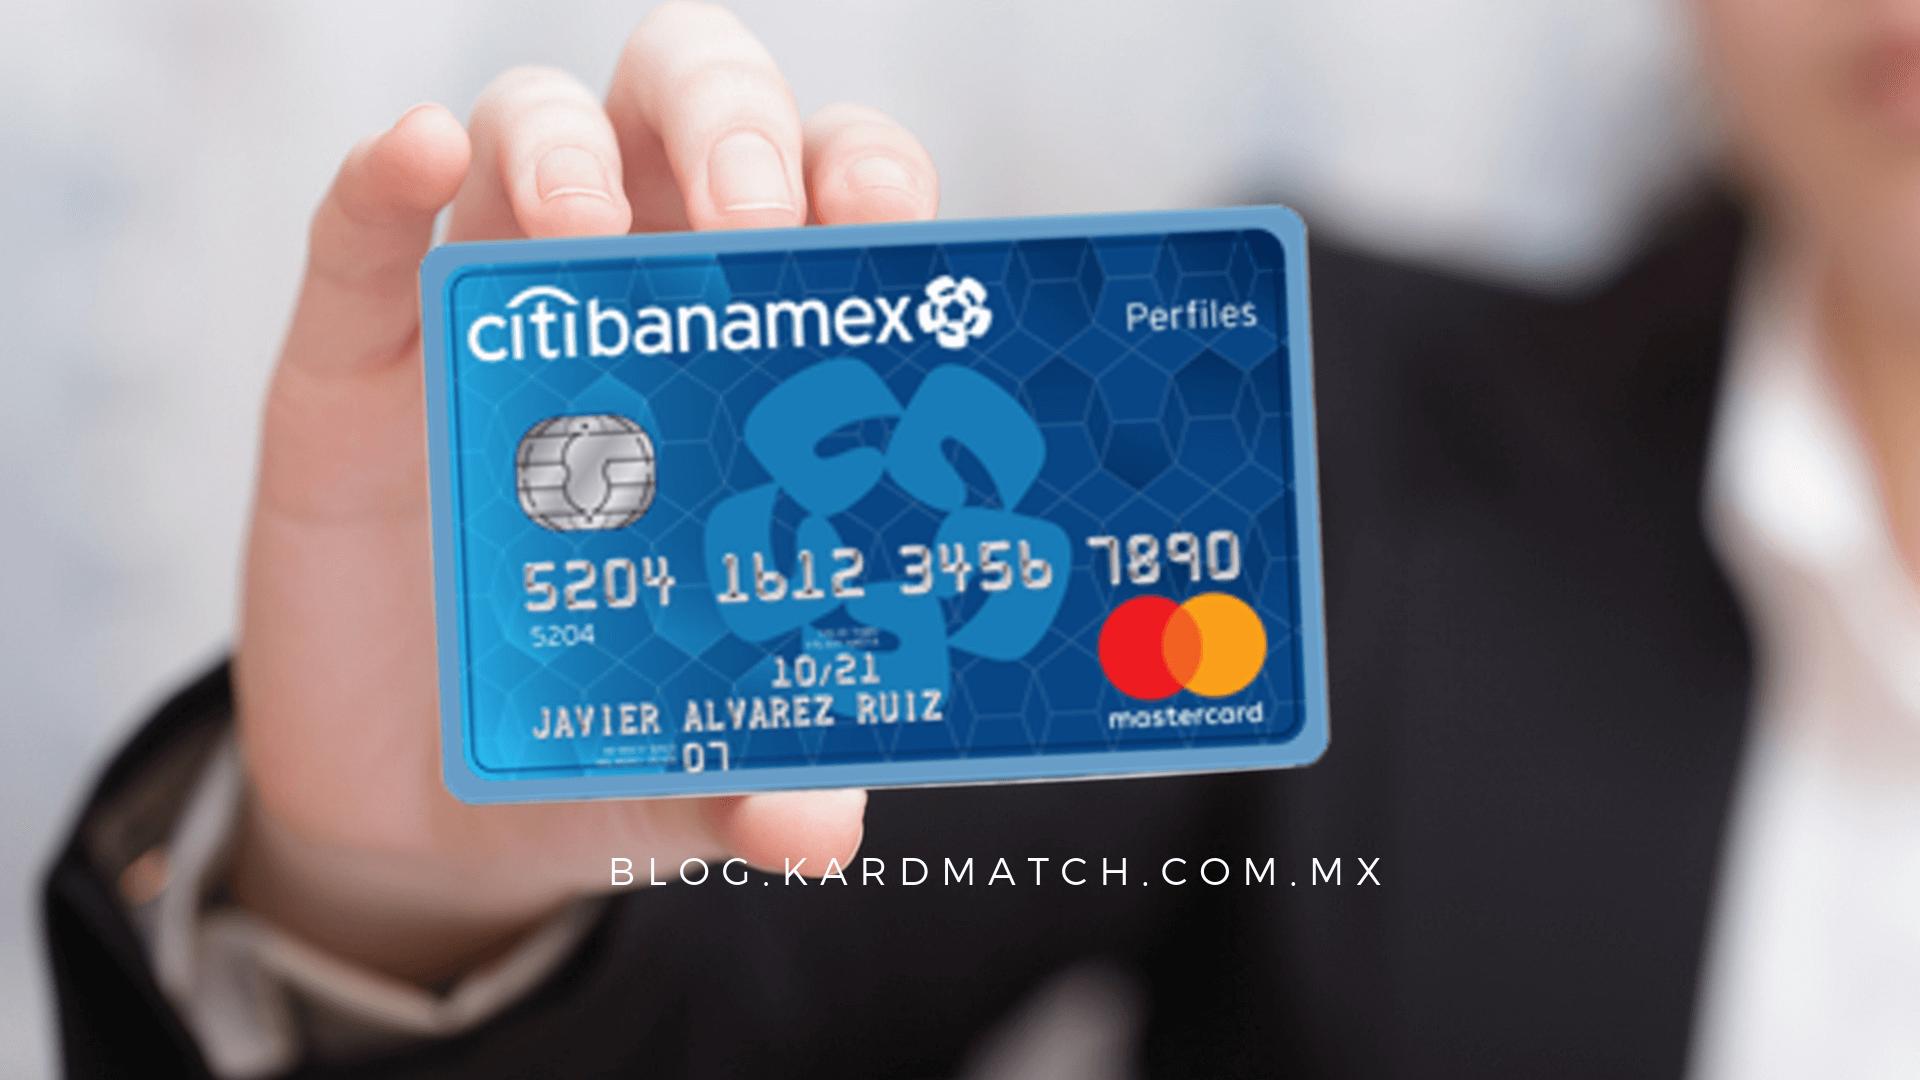 Tarjeta-débito-Citibanamex